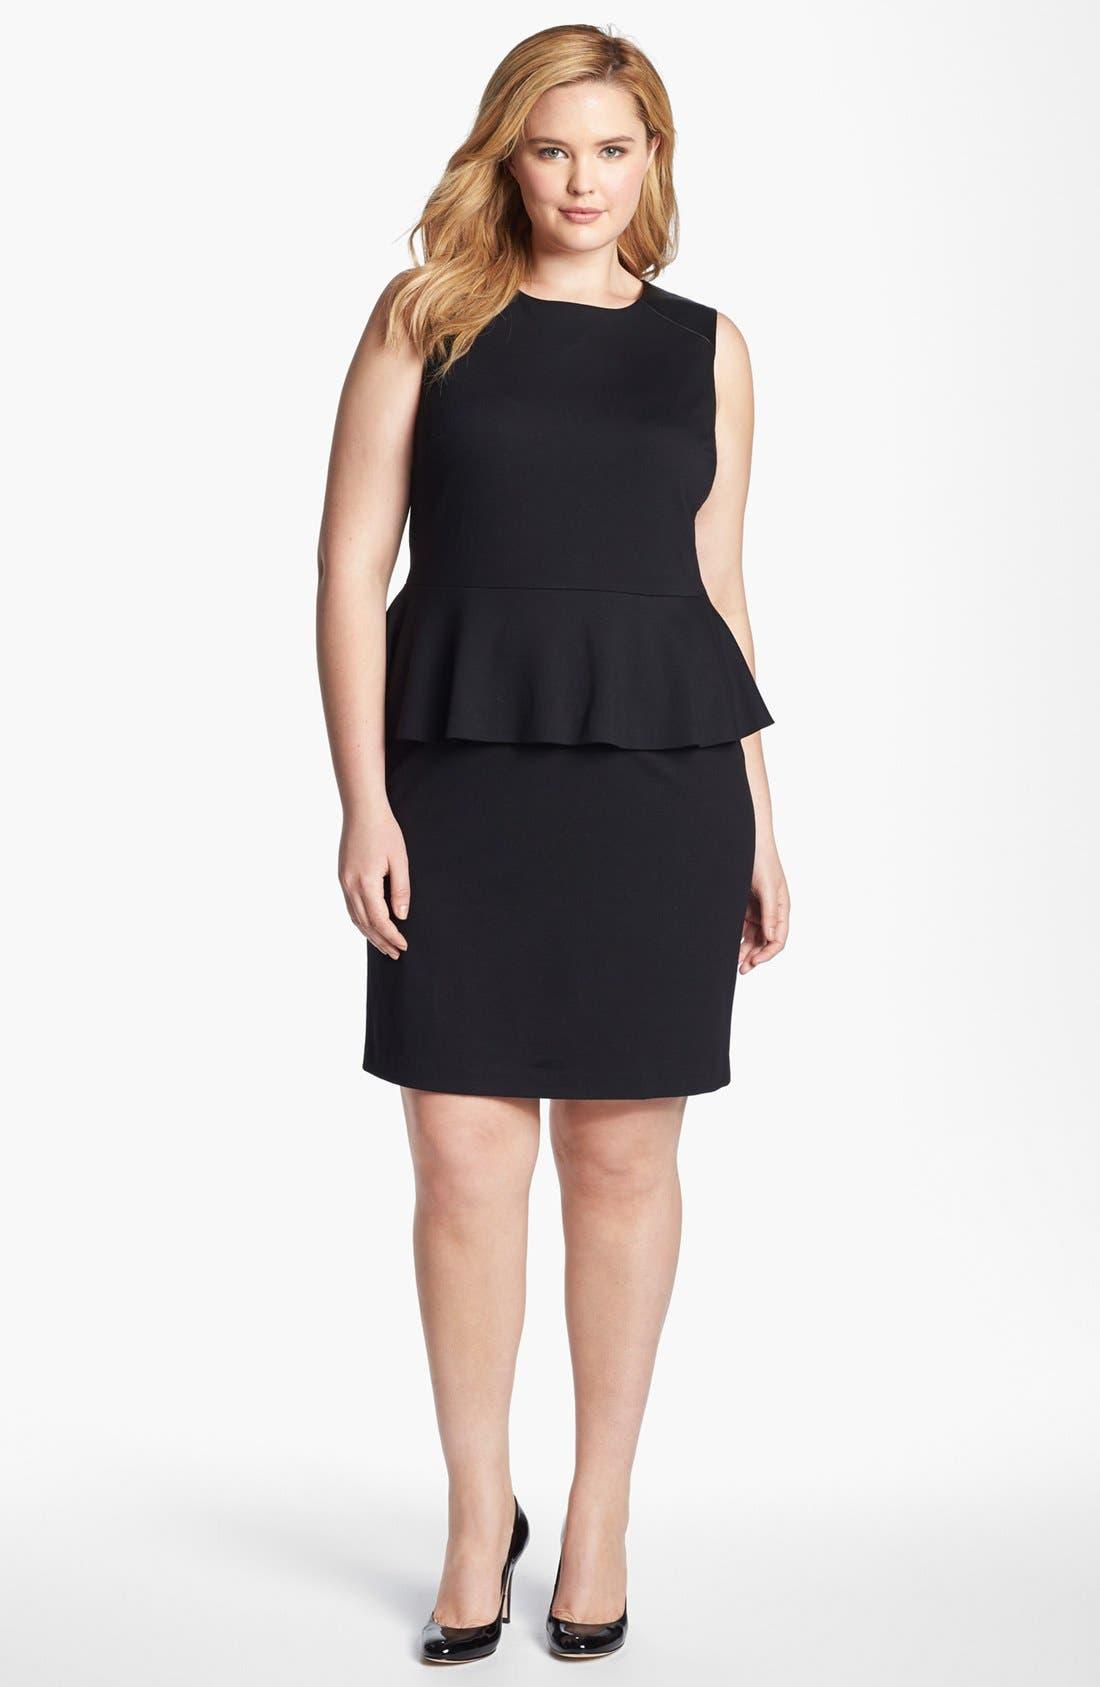 Alternate Image 1 Selected - Vince Camuto Sleeveless Peplum Sheath Dress (Plus Size) (Online Only)